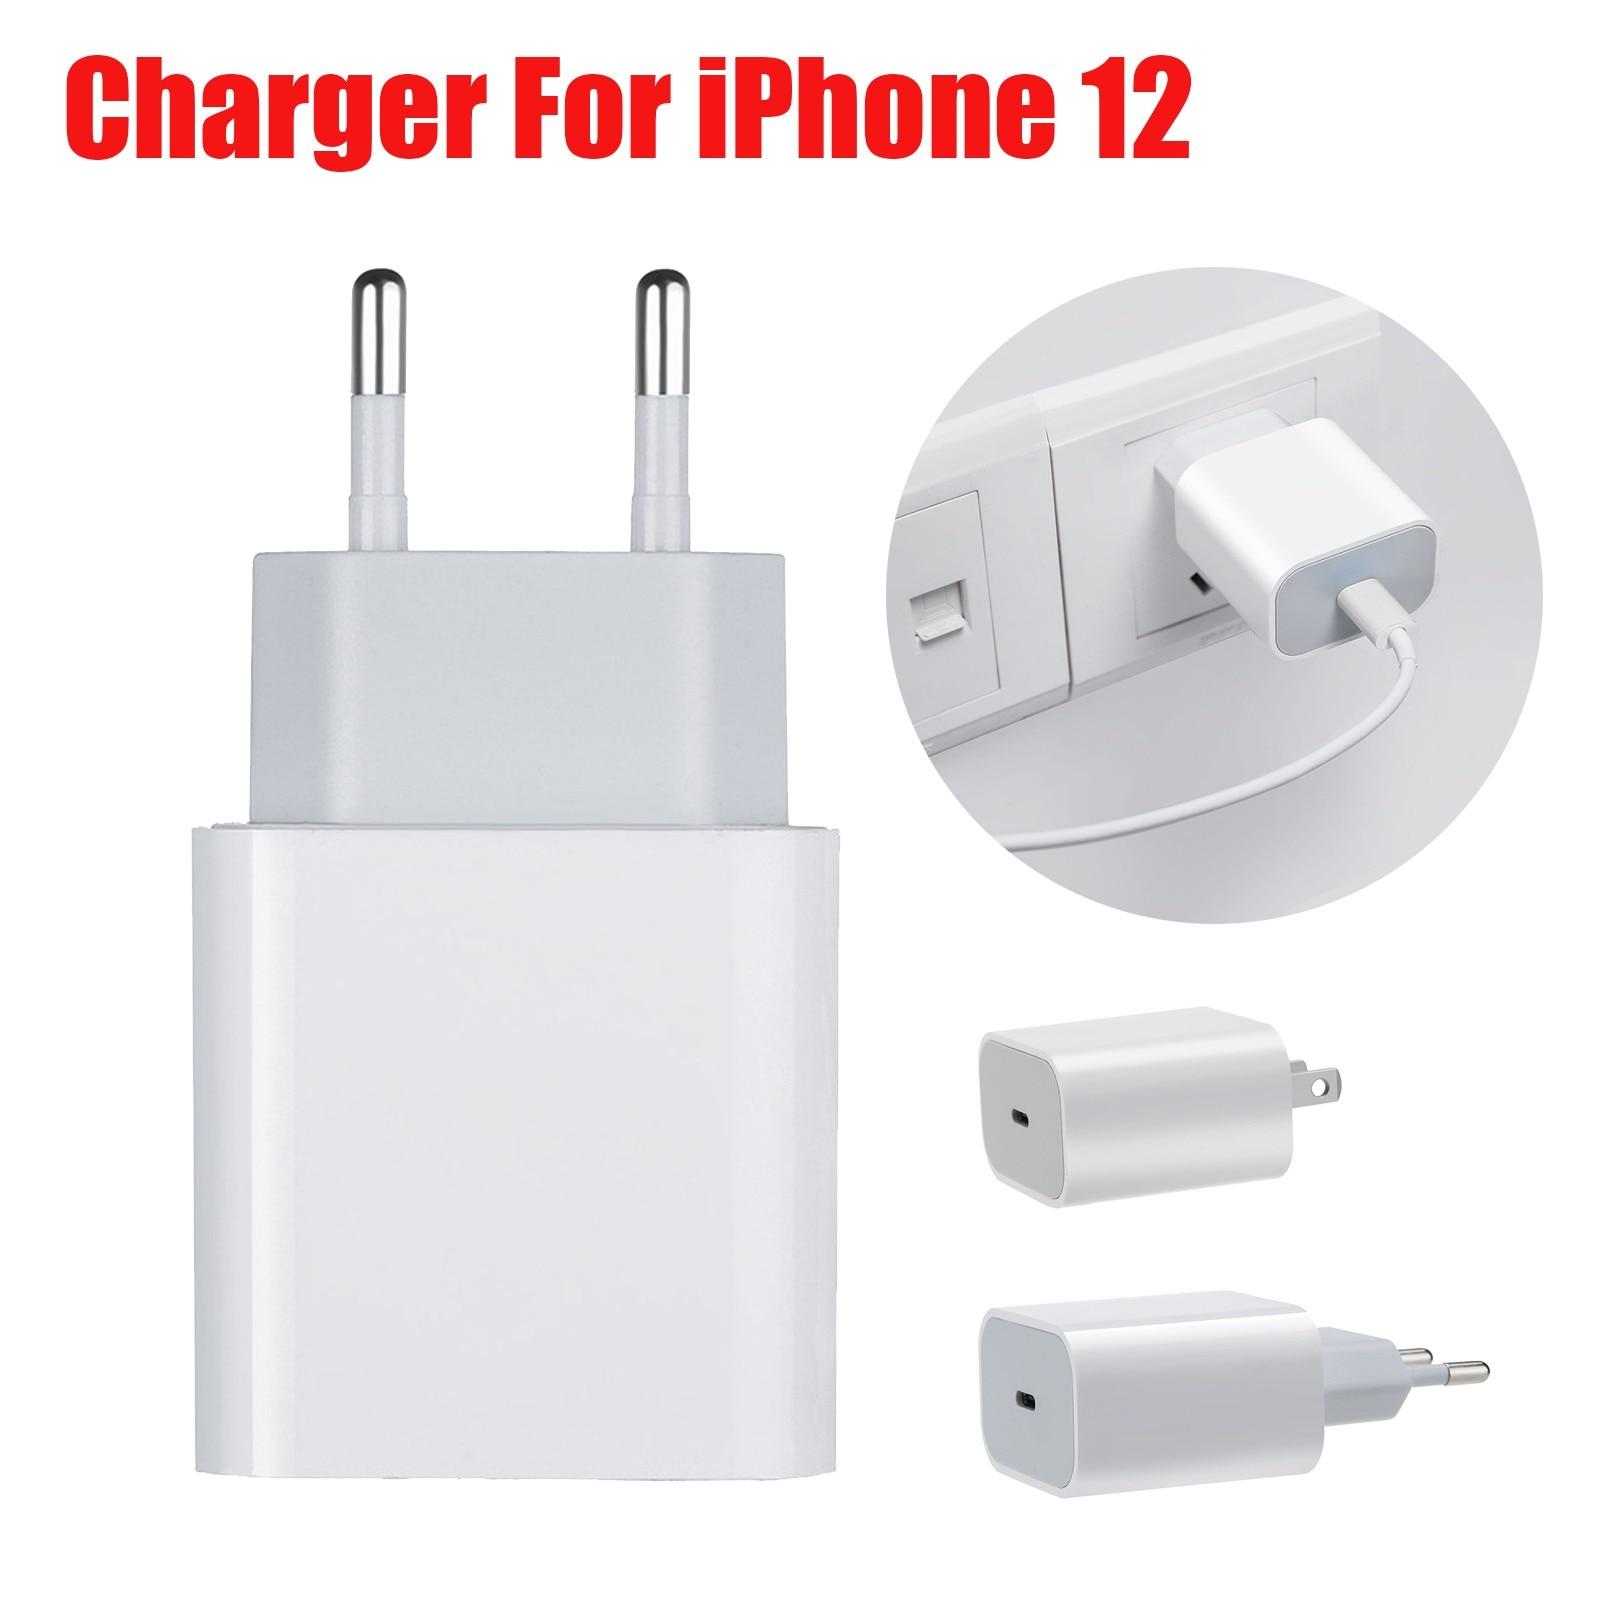 20 W Schnelle Ladung Ladegerät 18w Ladegerät USB-C Power Adapter Schnell Ladegerät Für iPhone 12 Qualcomm Quick Charge 3,0 reise Ladegerät